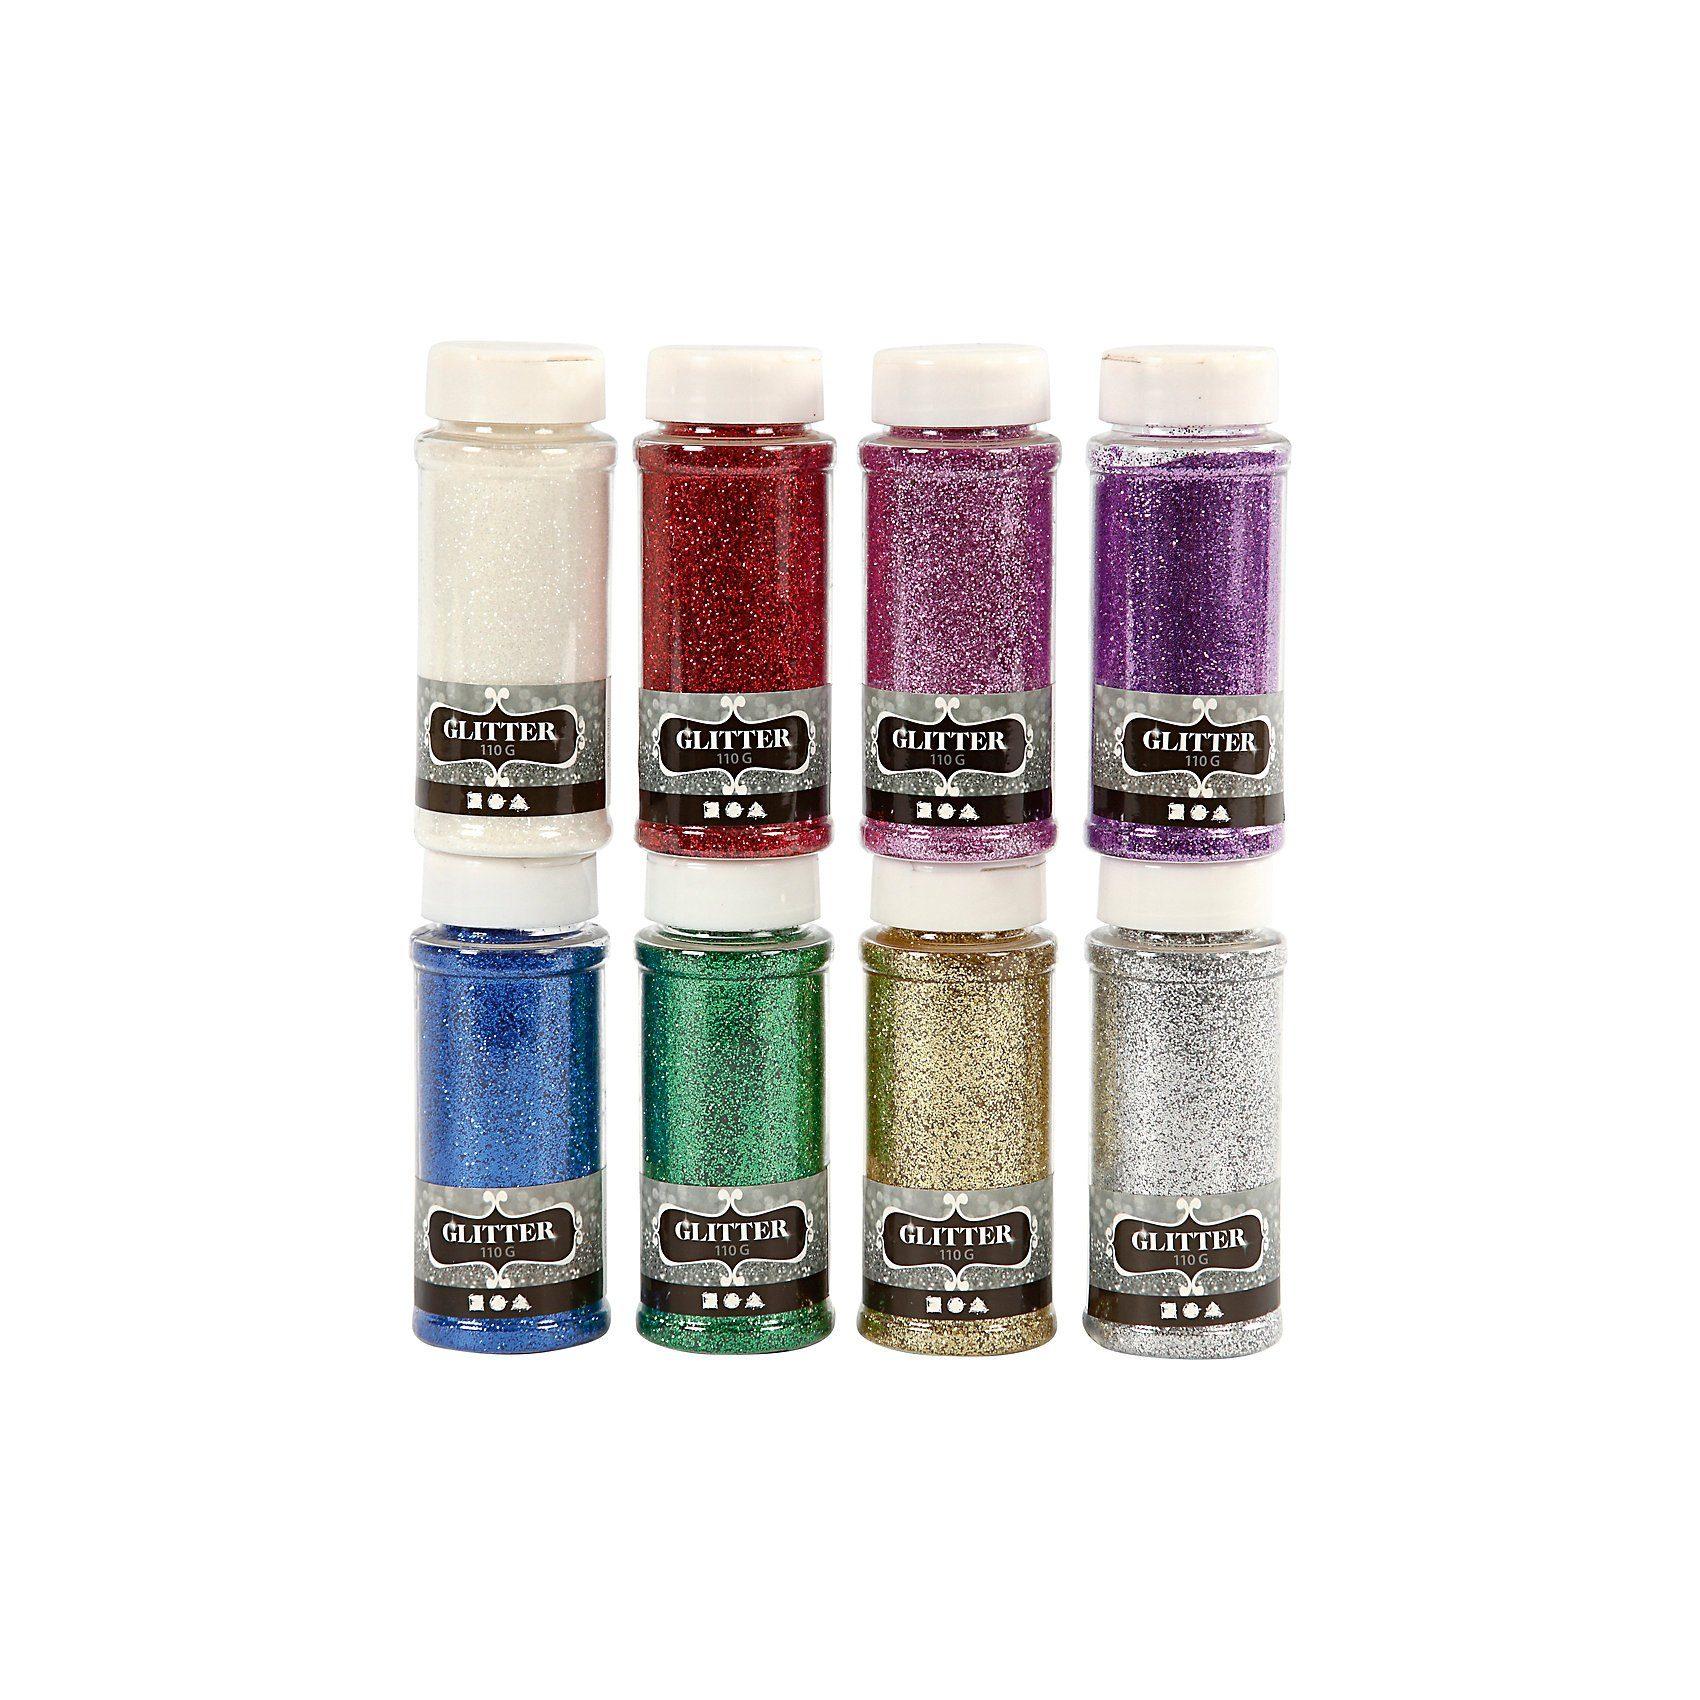 Deko-Glitter, 8x110 g, sortierte Farben